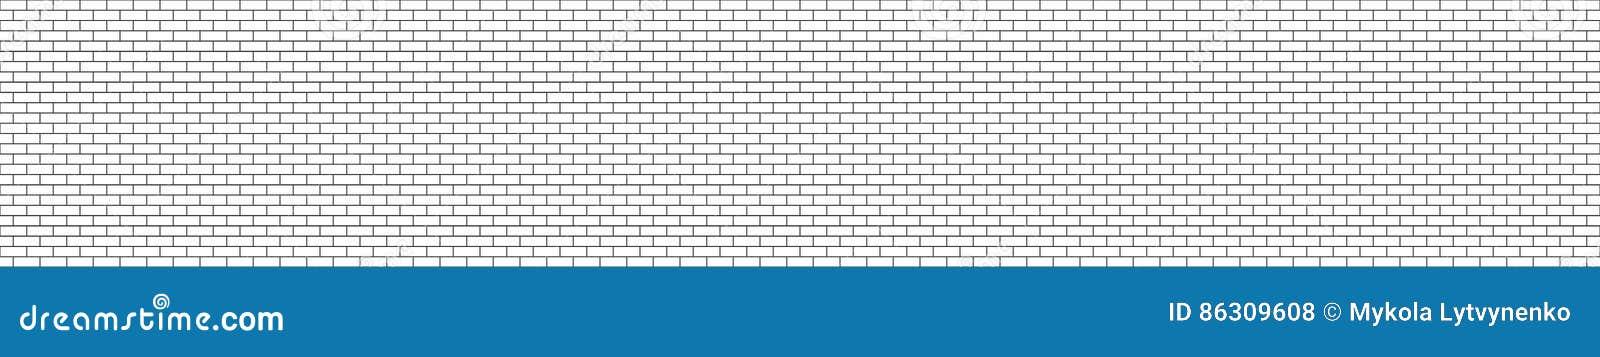 Parede sem emenda do tijolo estrutural preto e branco do panorama